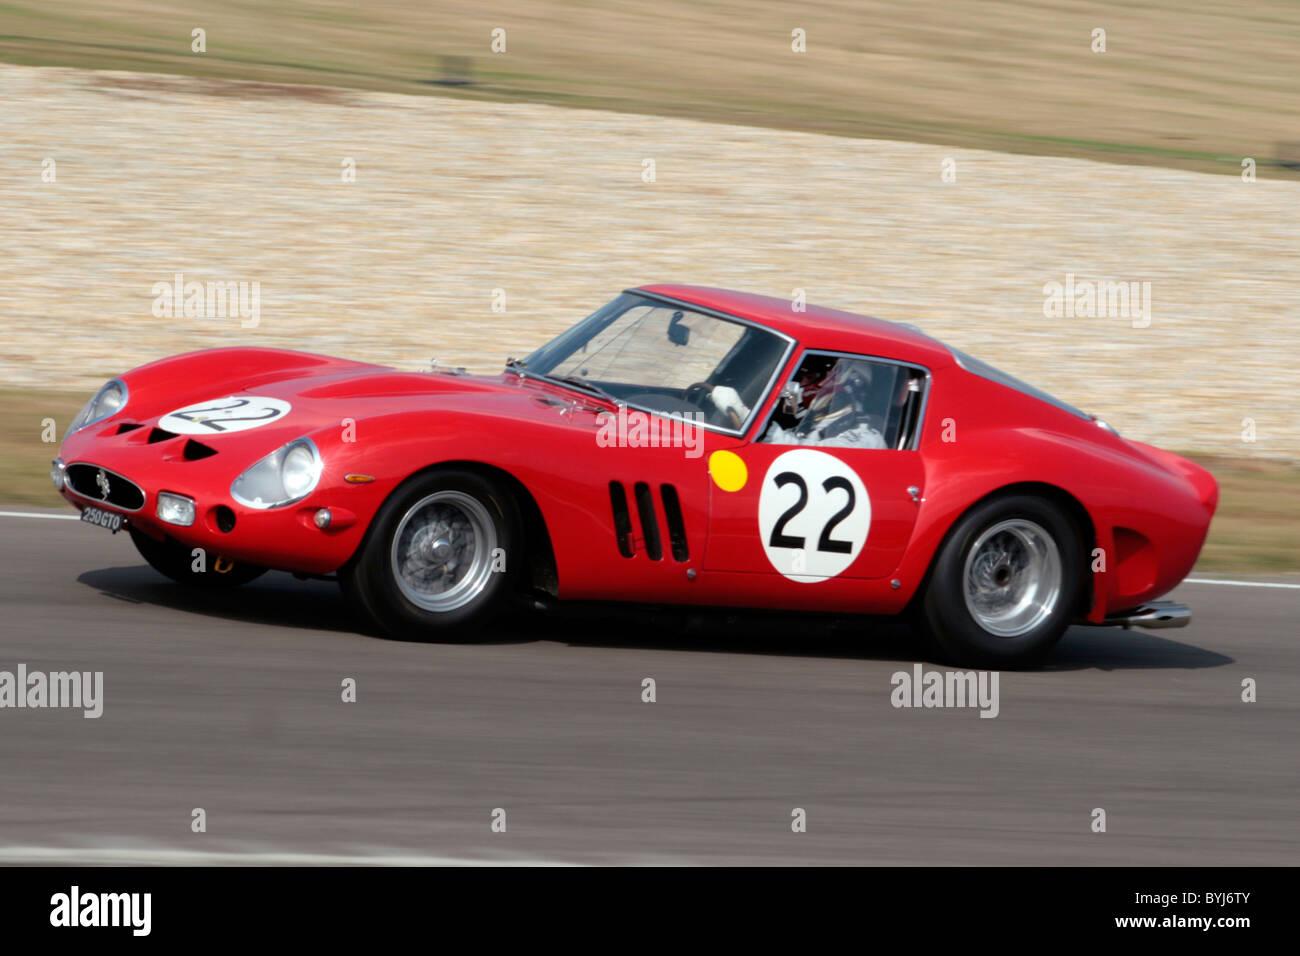 Naples Car Show 2018 >> Ferrari 250 Gt Berlinetta Stock Photos & Ferrari 250 Gt Berlinetta Stock Images - Alamy